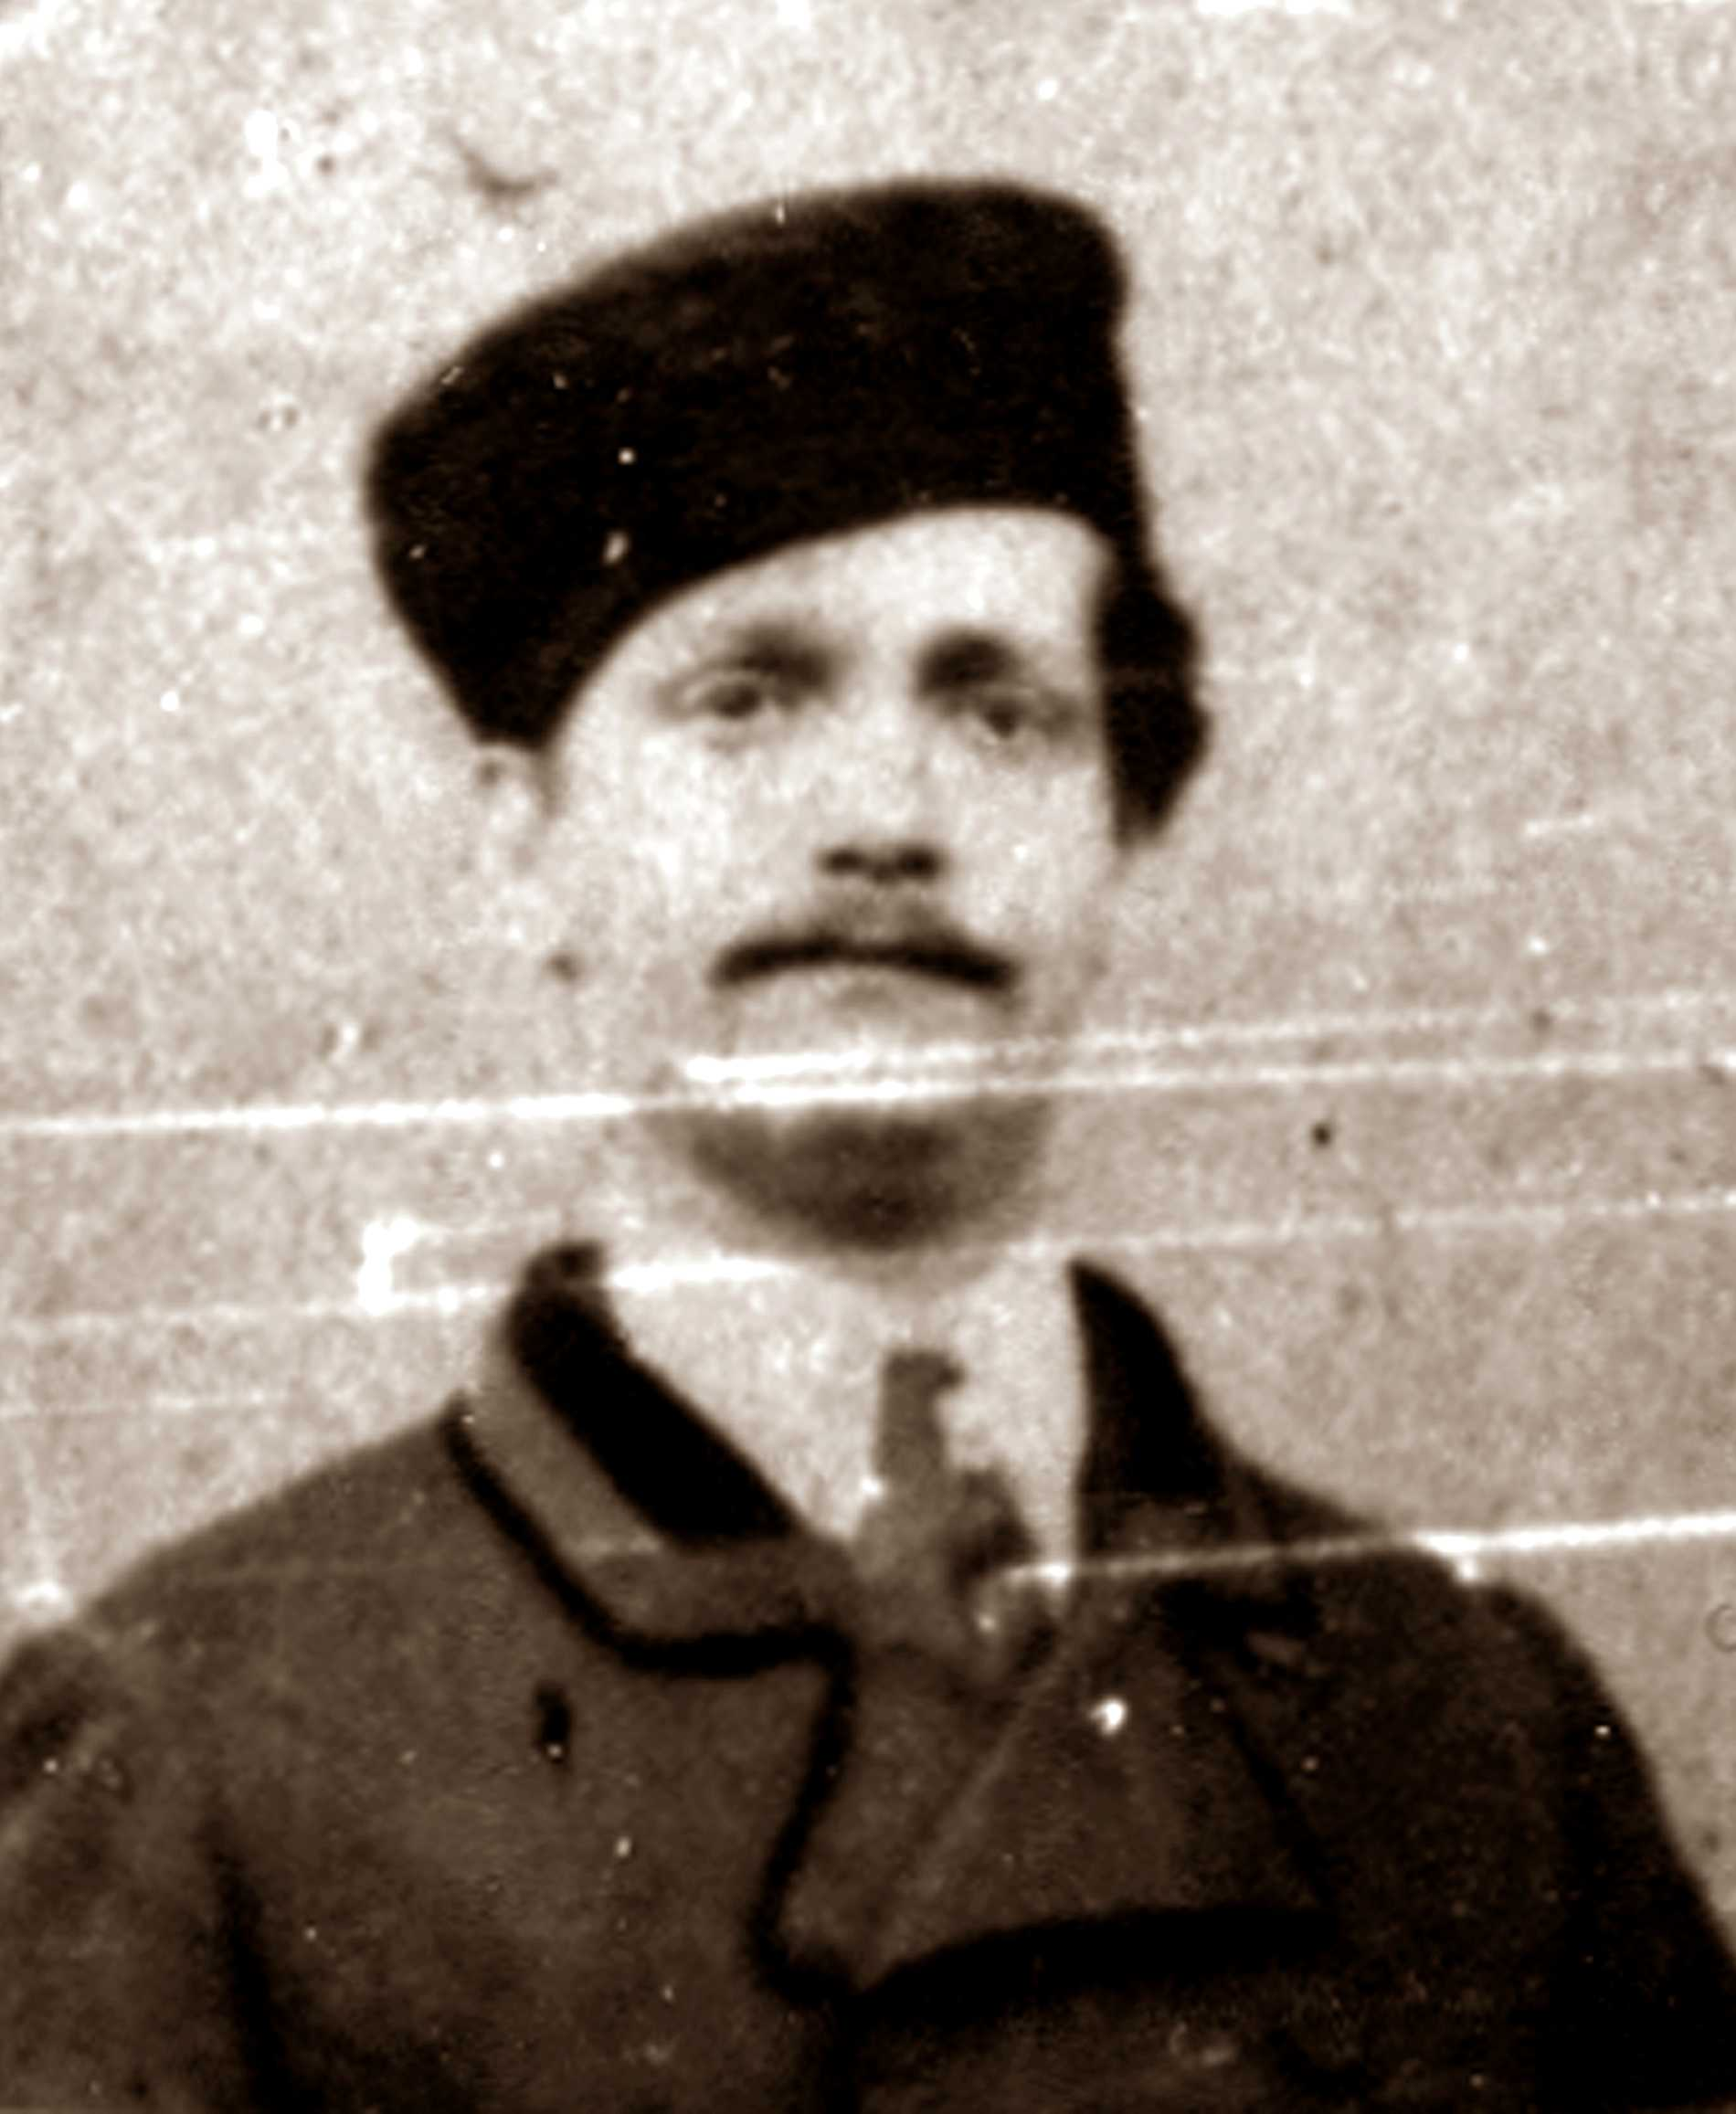 Carlo Bertini (ca. 1870-1872)